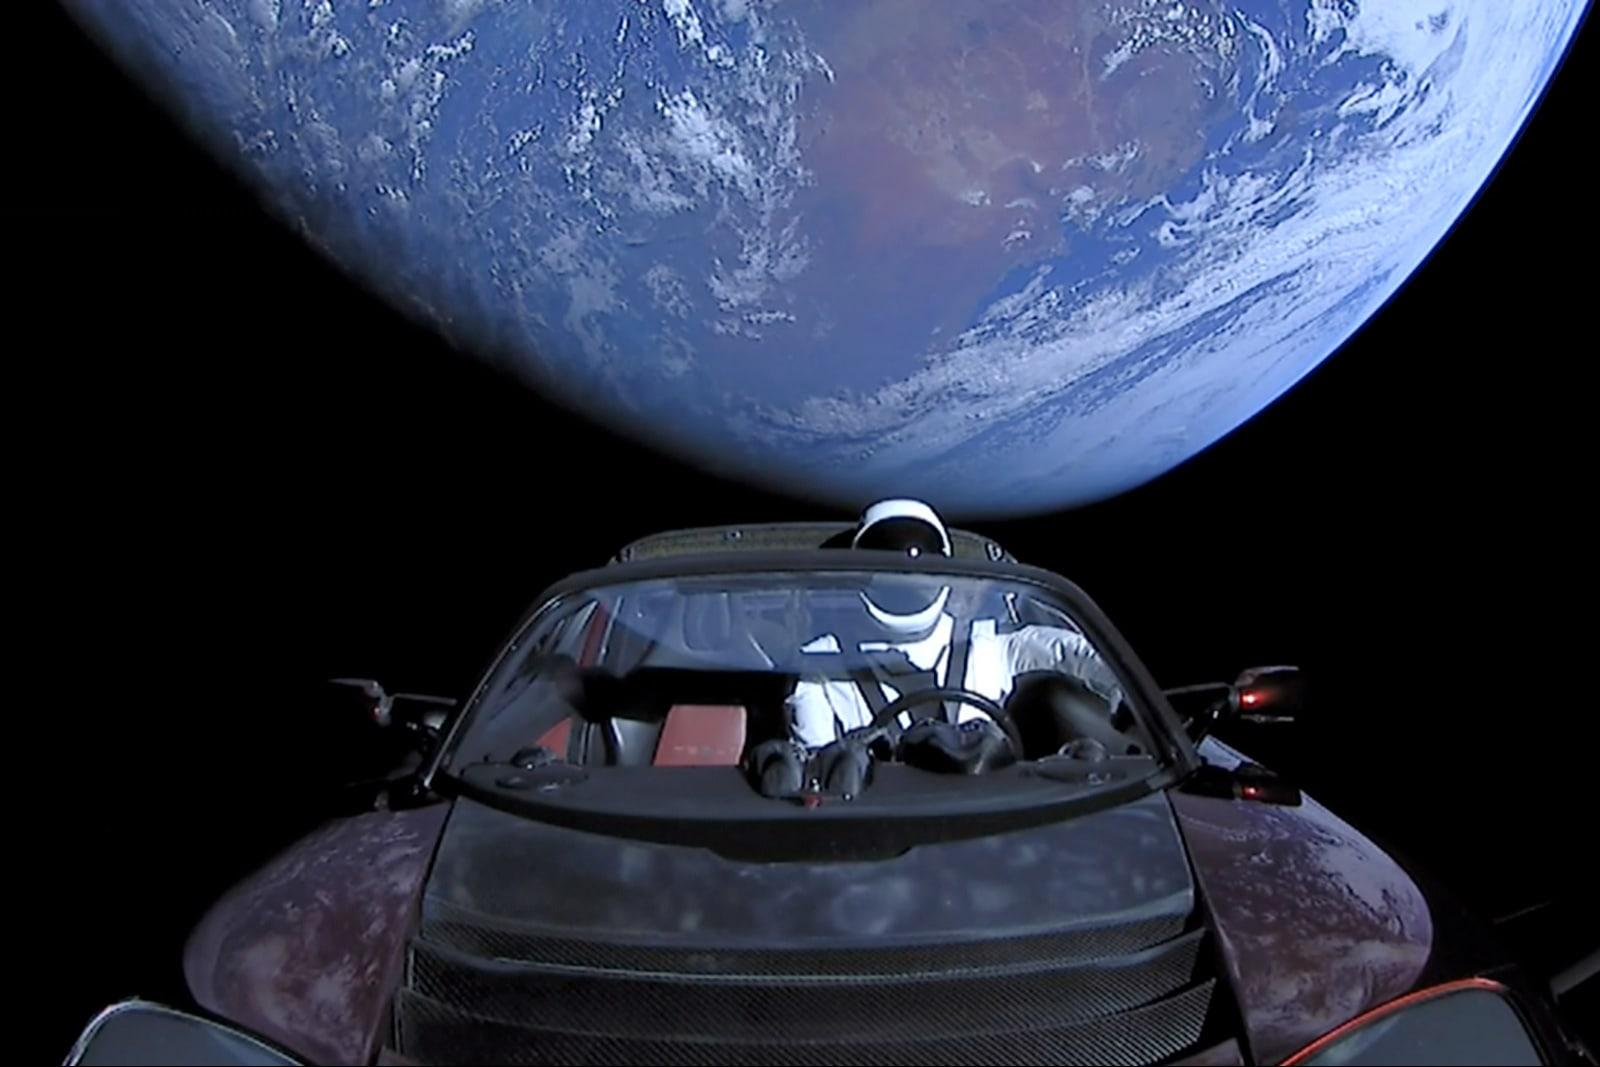 Website follows journey of Elon Musk's Tesla Roadster through space